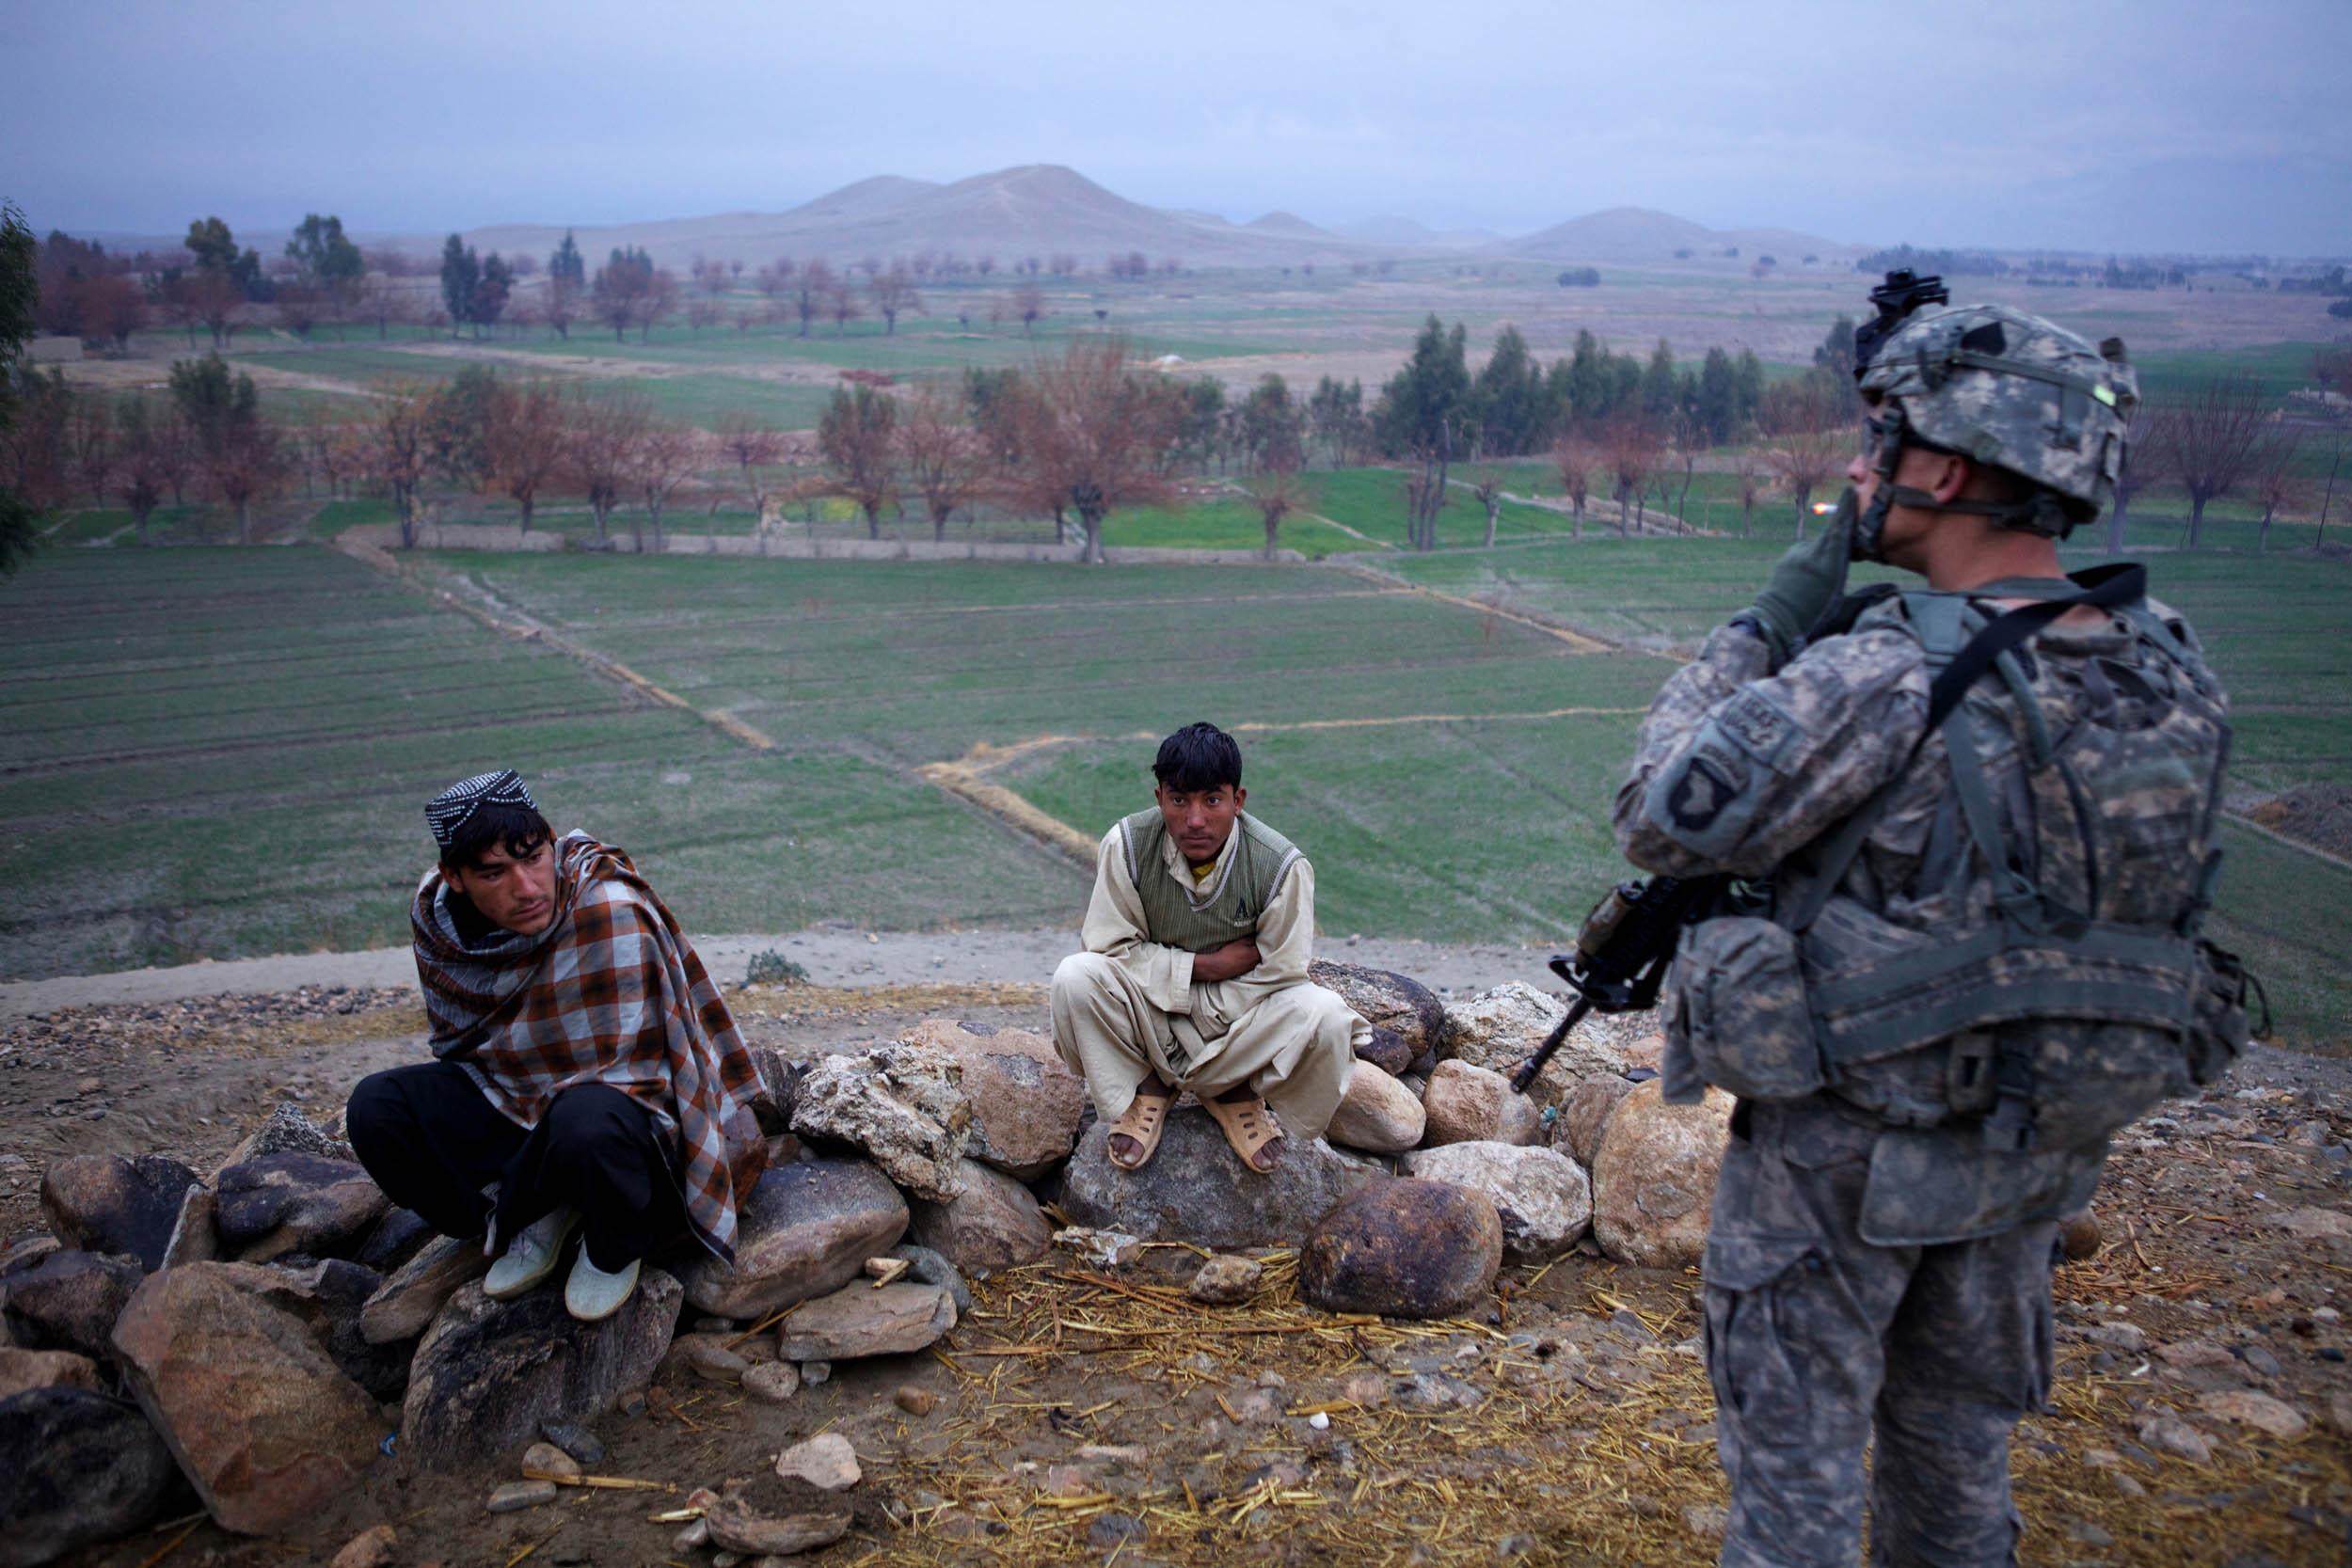 Nangarhar Province, Afghanistan. 2011